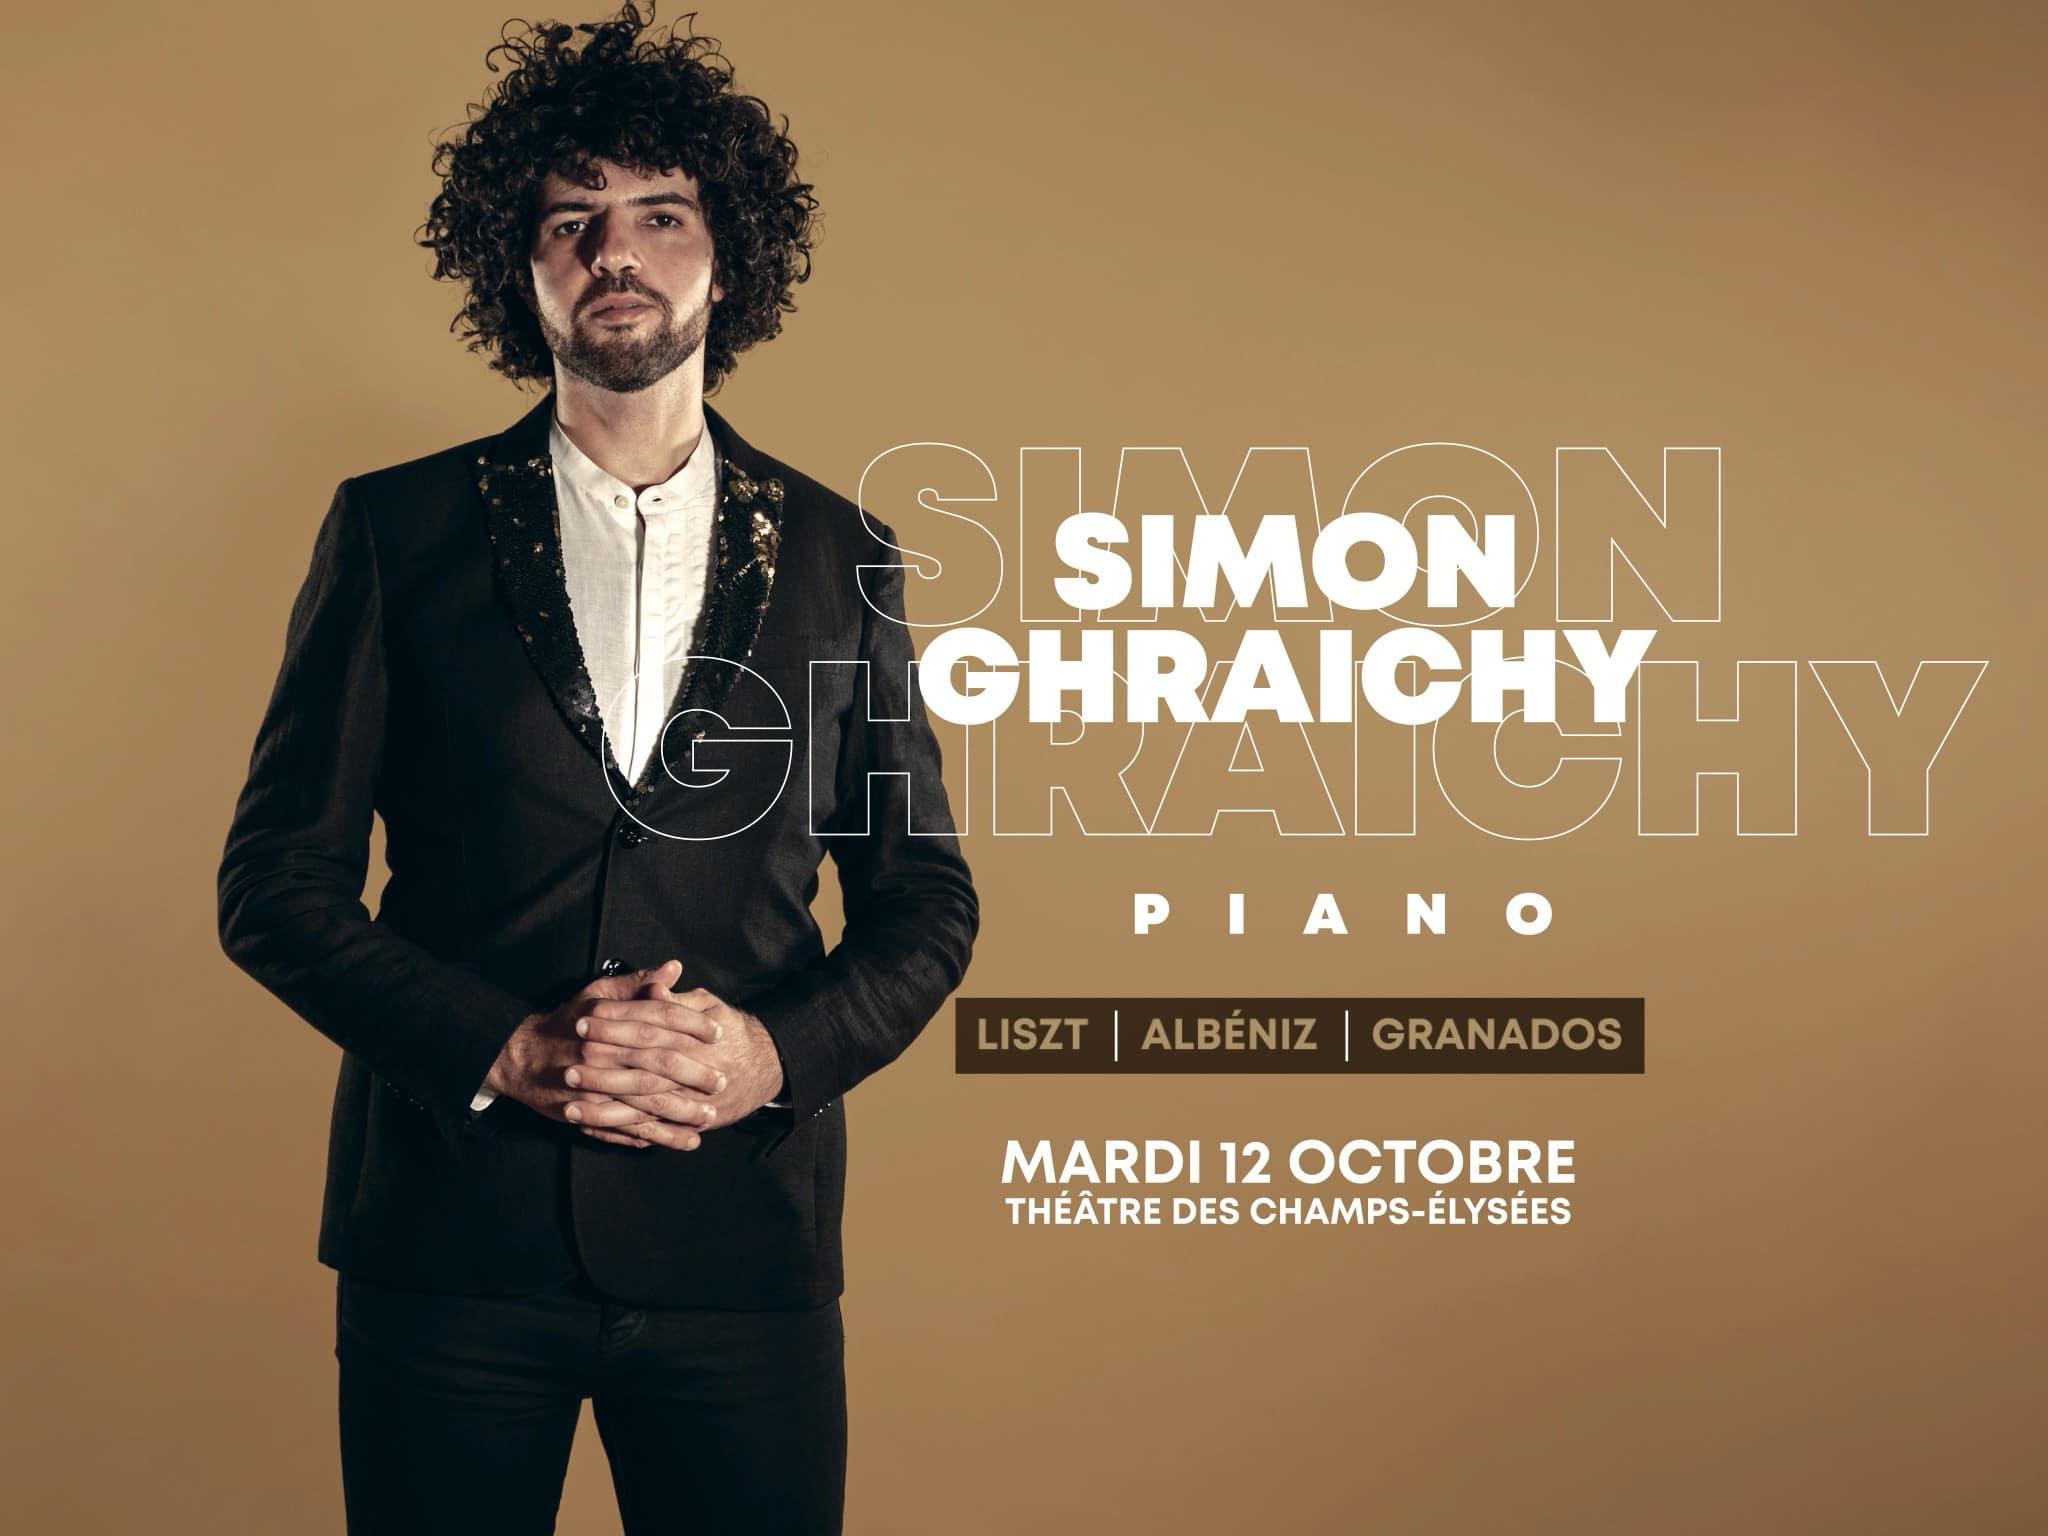 simon ghraichy concert paris piano octobre musique classique